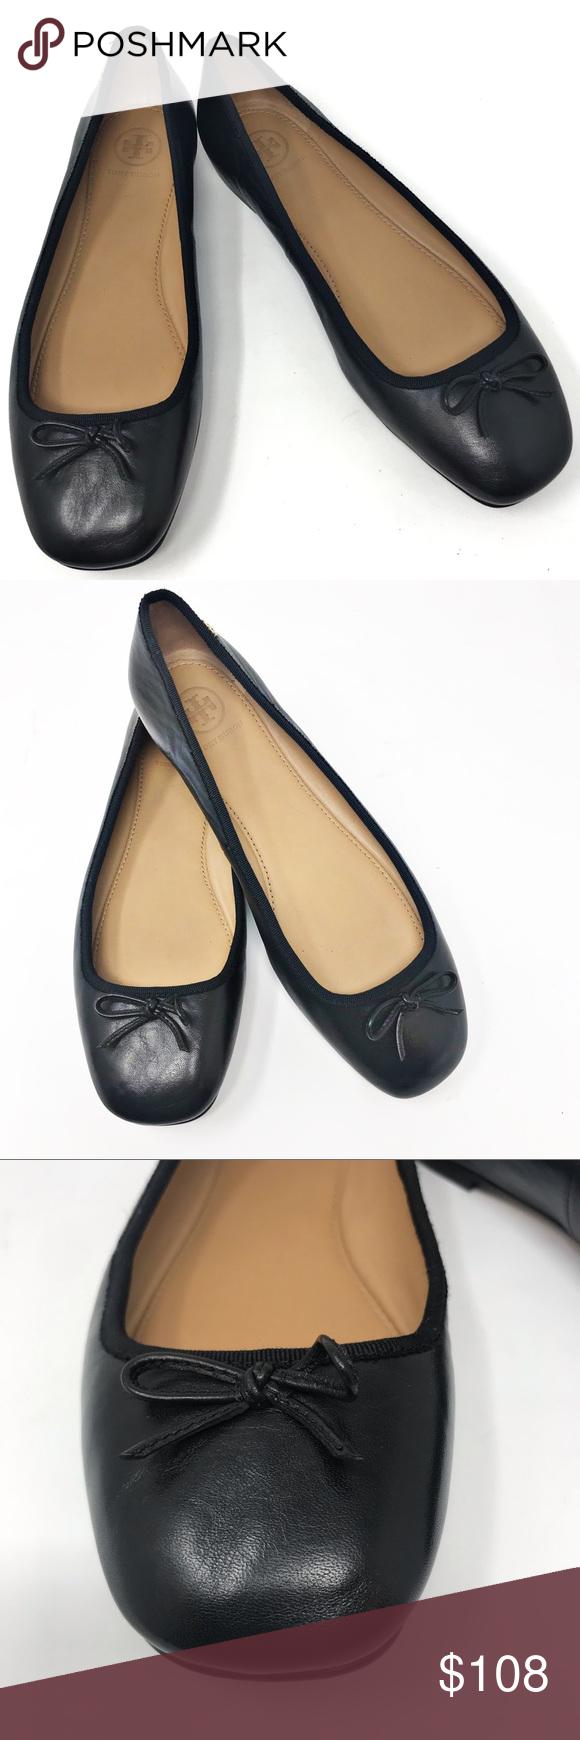 2d2e22a6d8b Tory Burch Laila 2 Black Leather Ballet Flat 7.5 Tory Burch Laila 2 Perfect  Black Leather